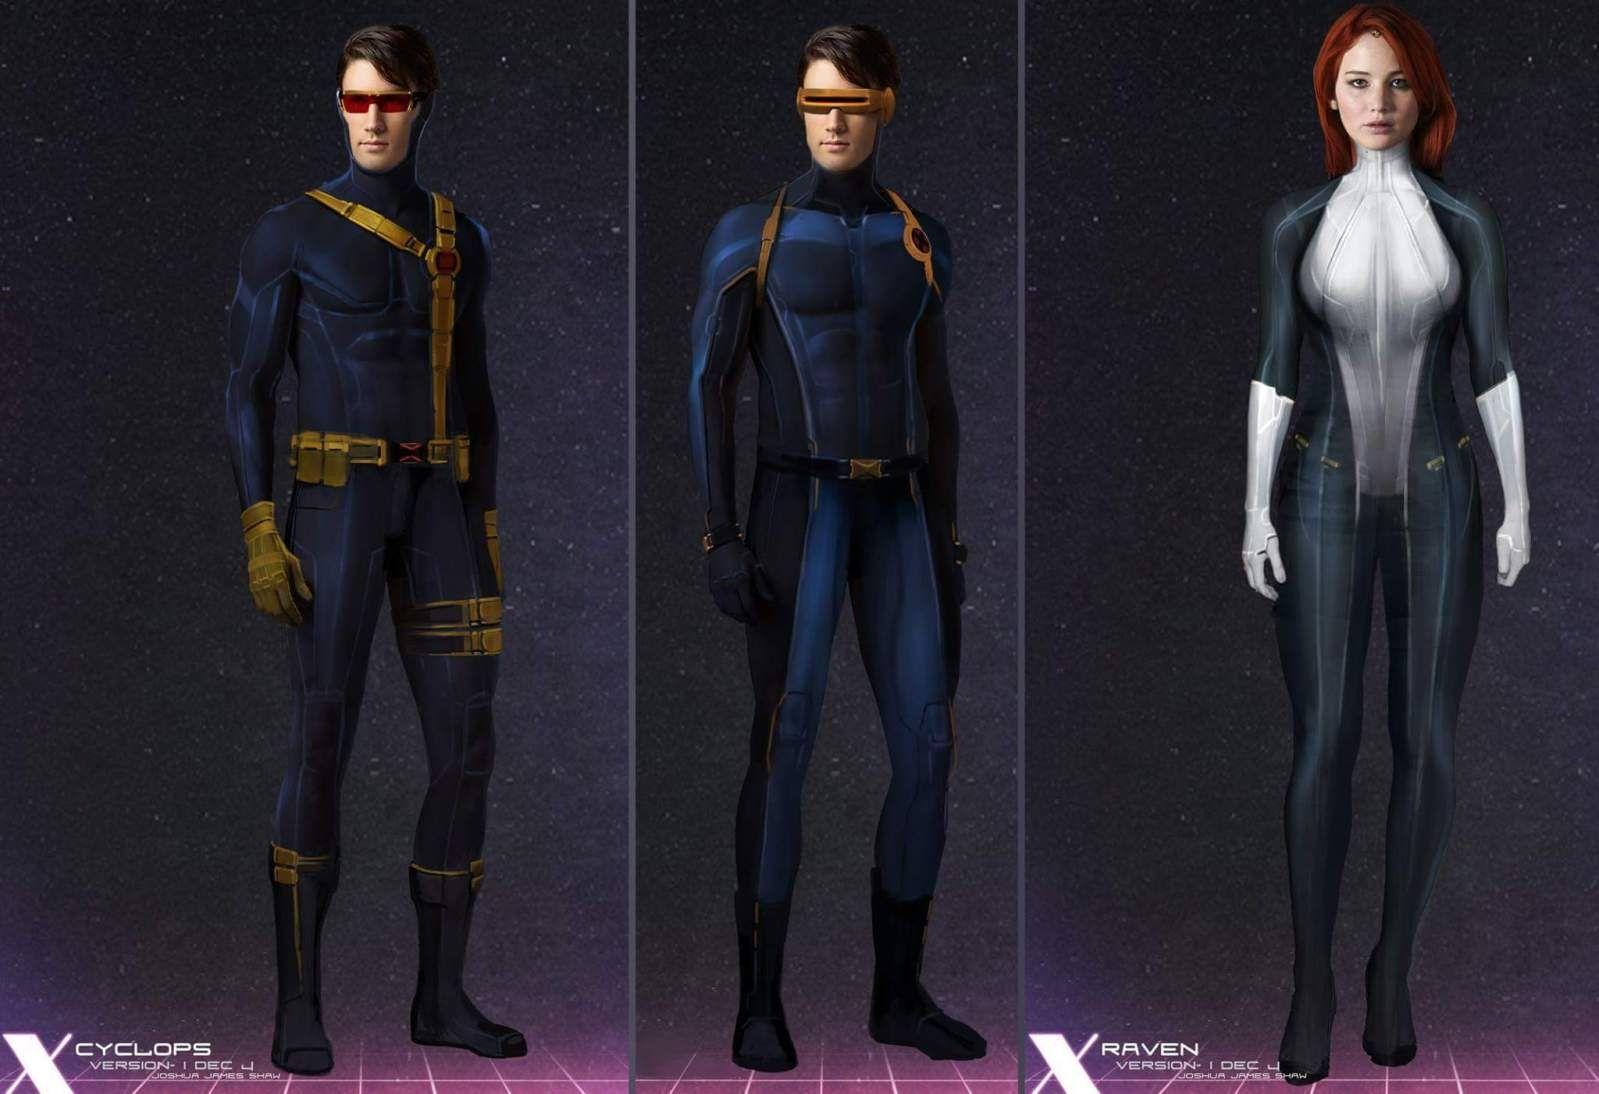 New X Men Apocalypse Concept Art Reveals Alternate